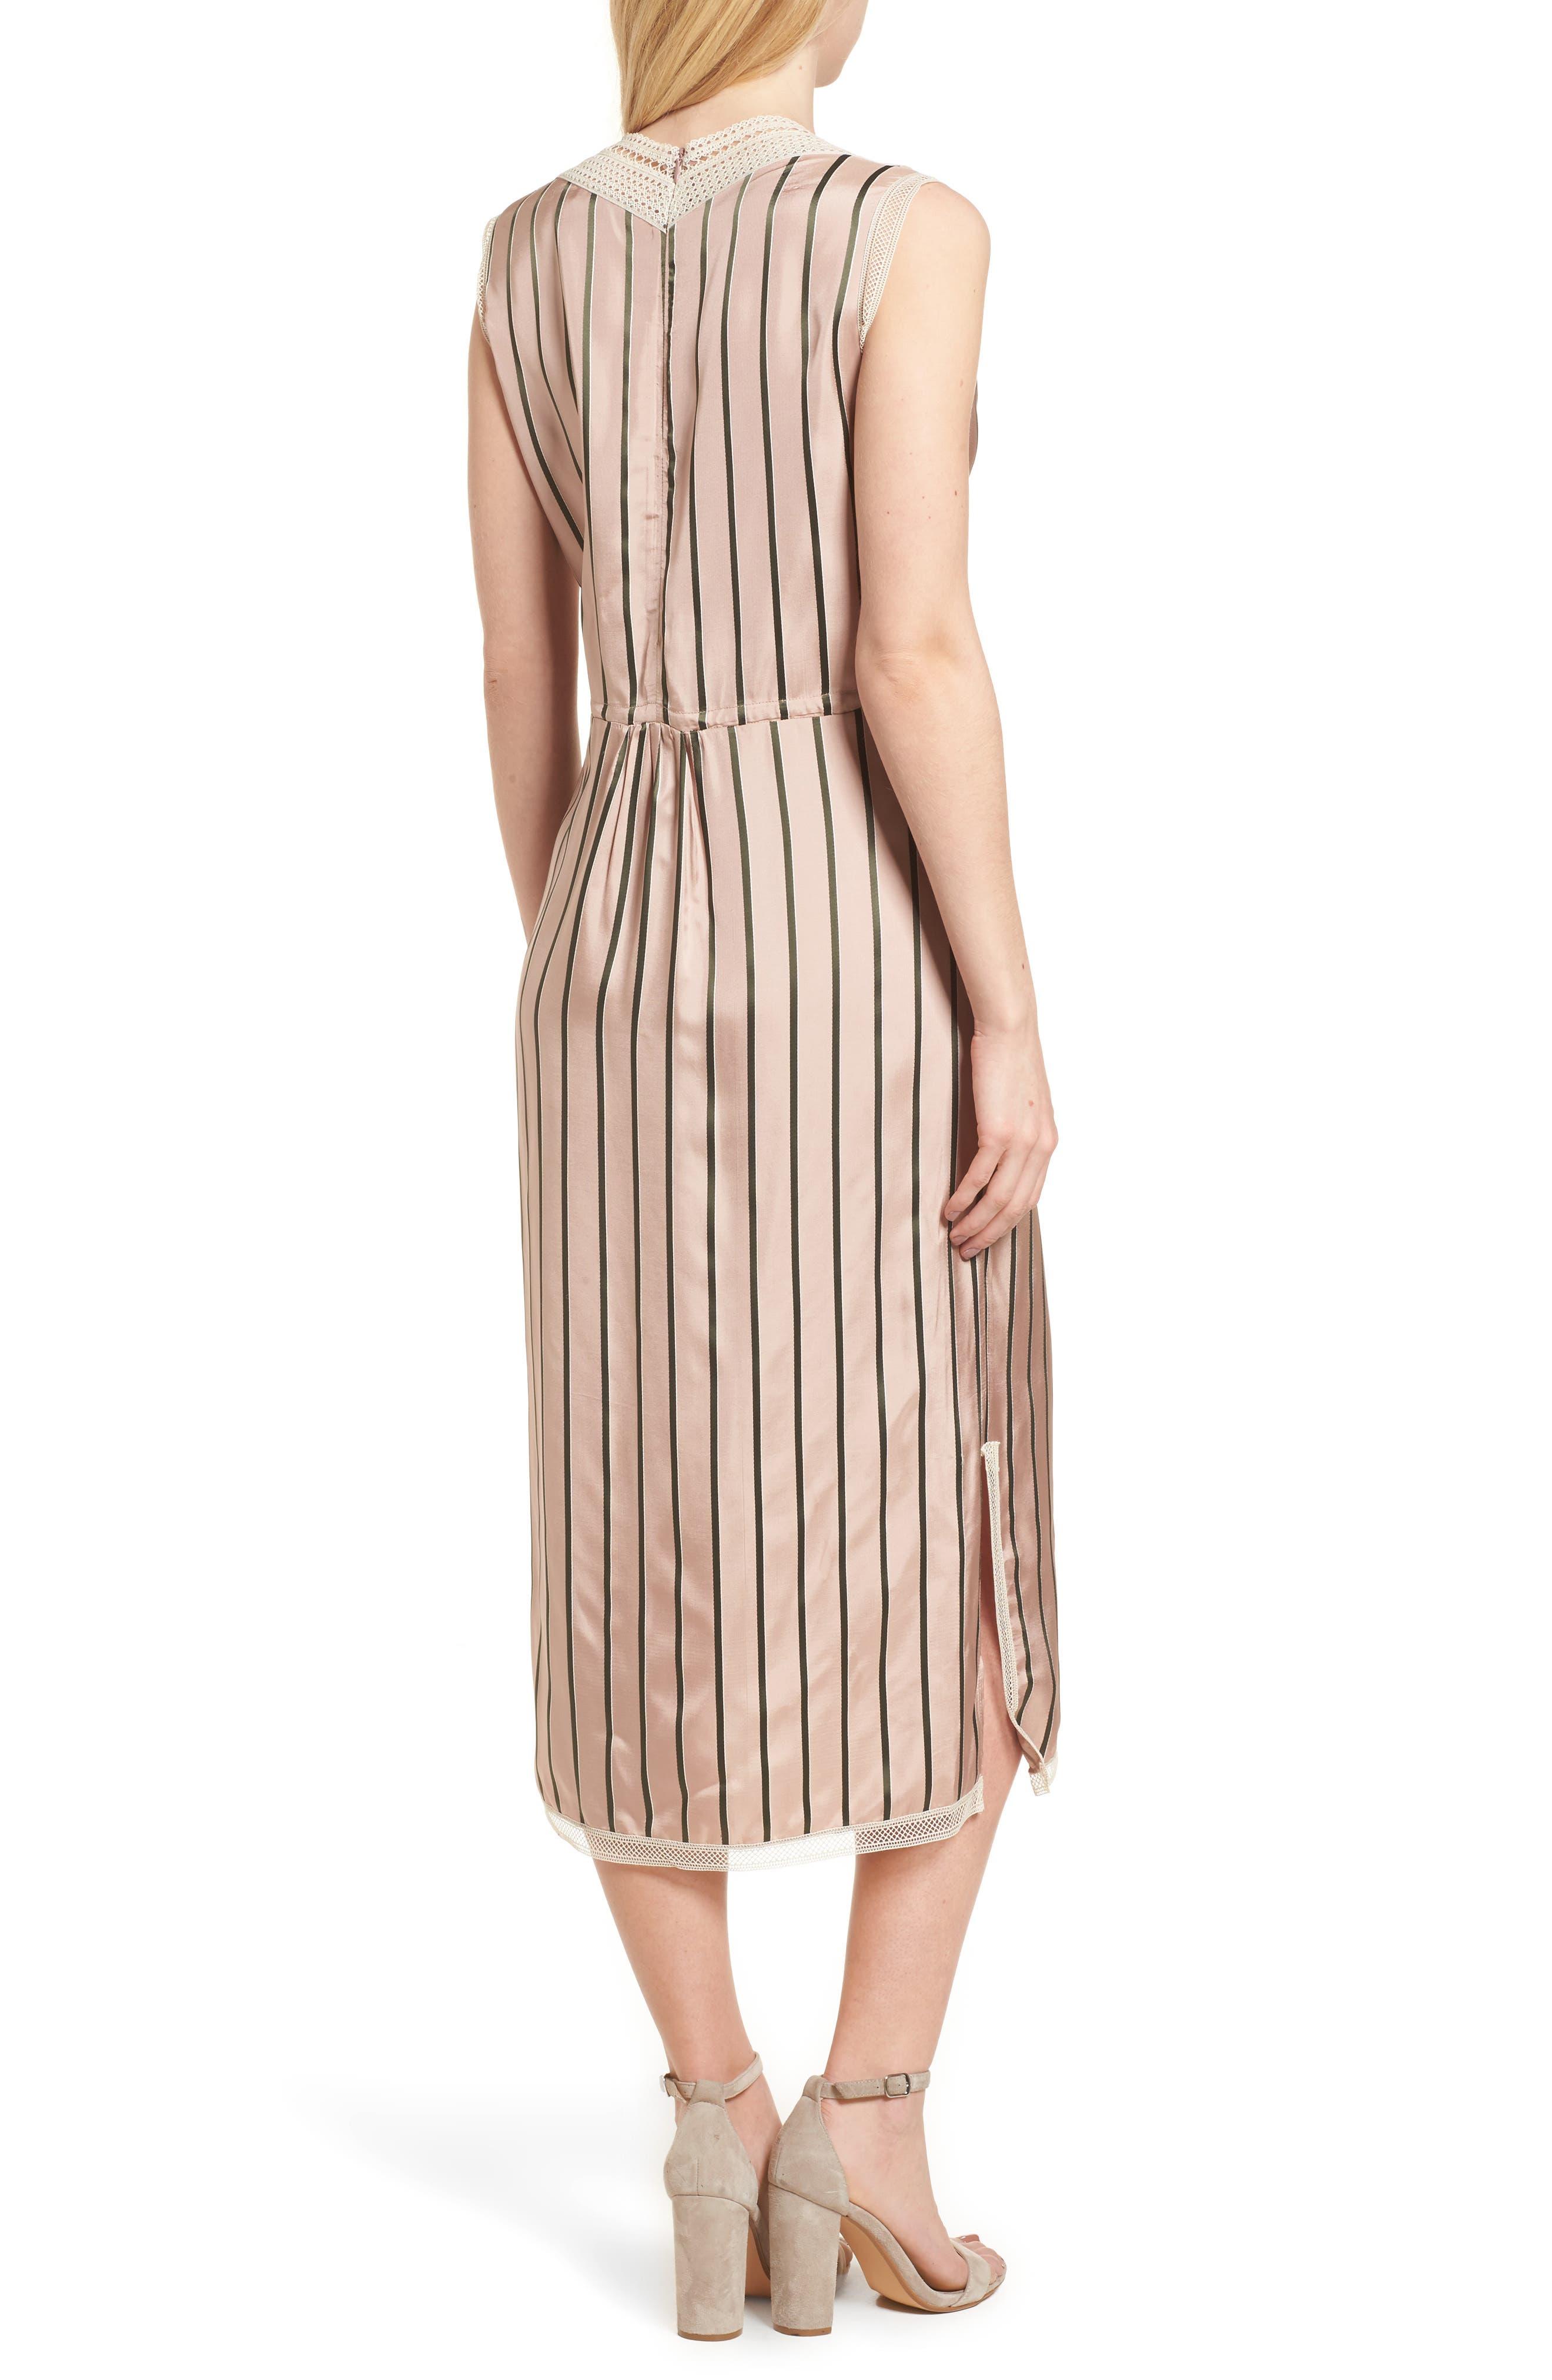 Cosway Dress,                             Alternate thumbnail 2, color,                             Salmon